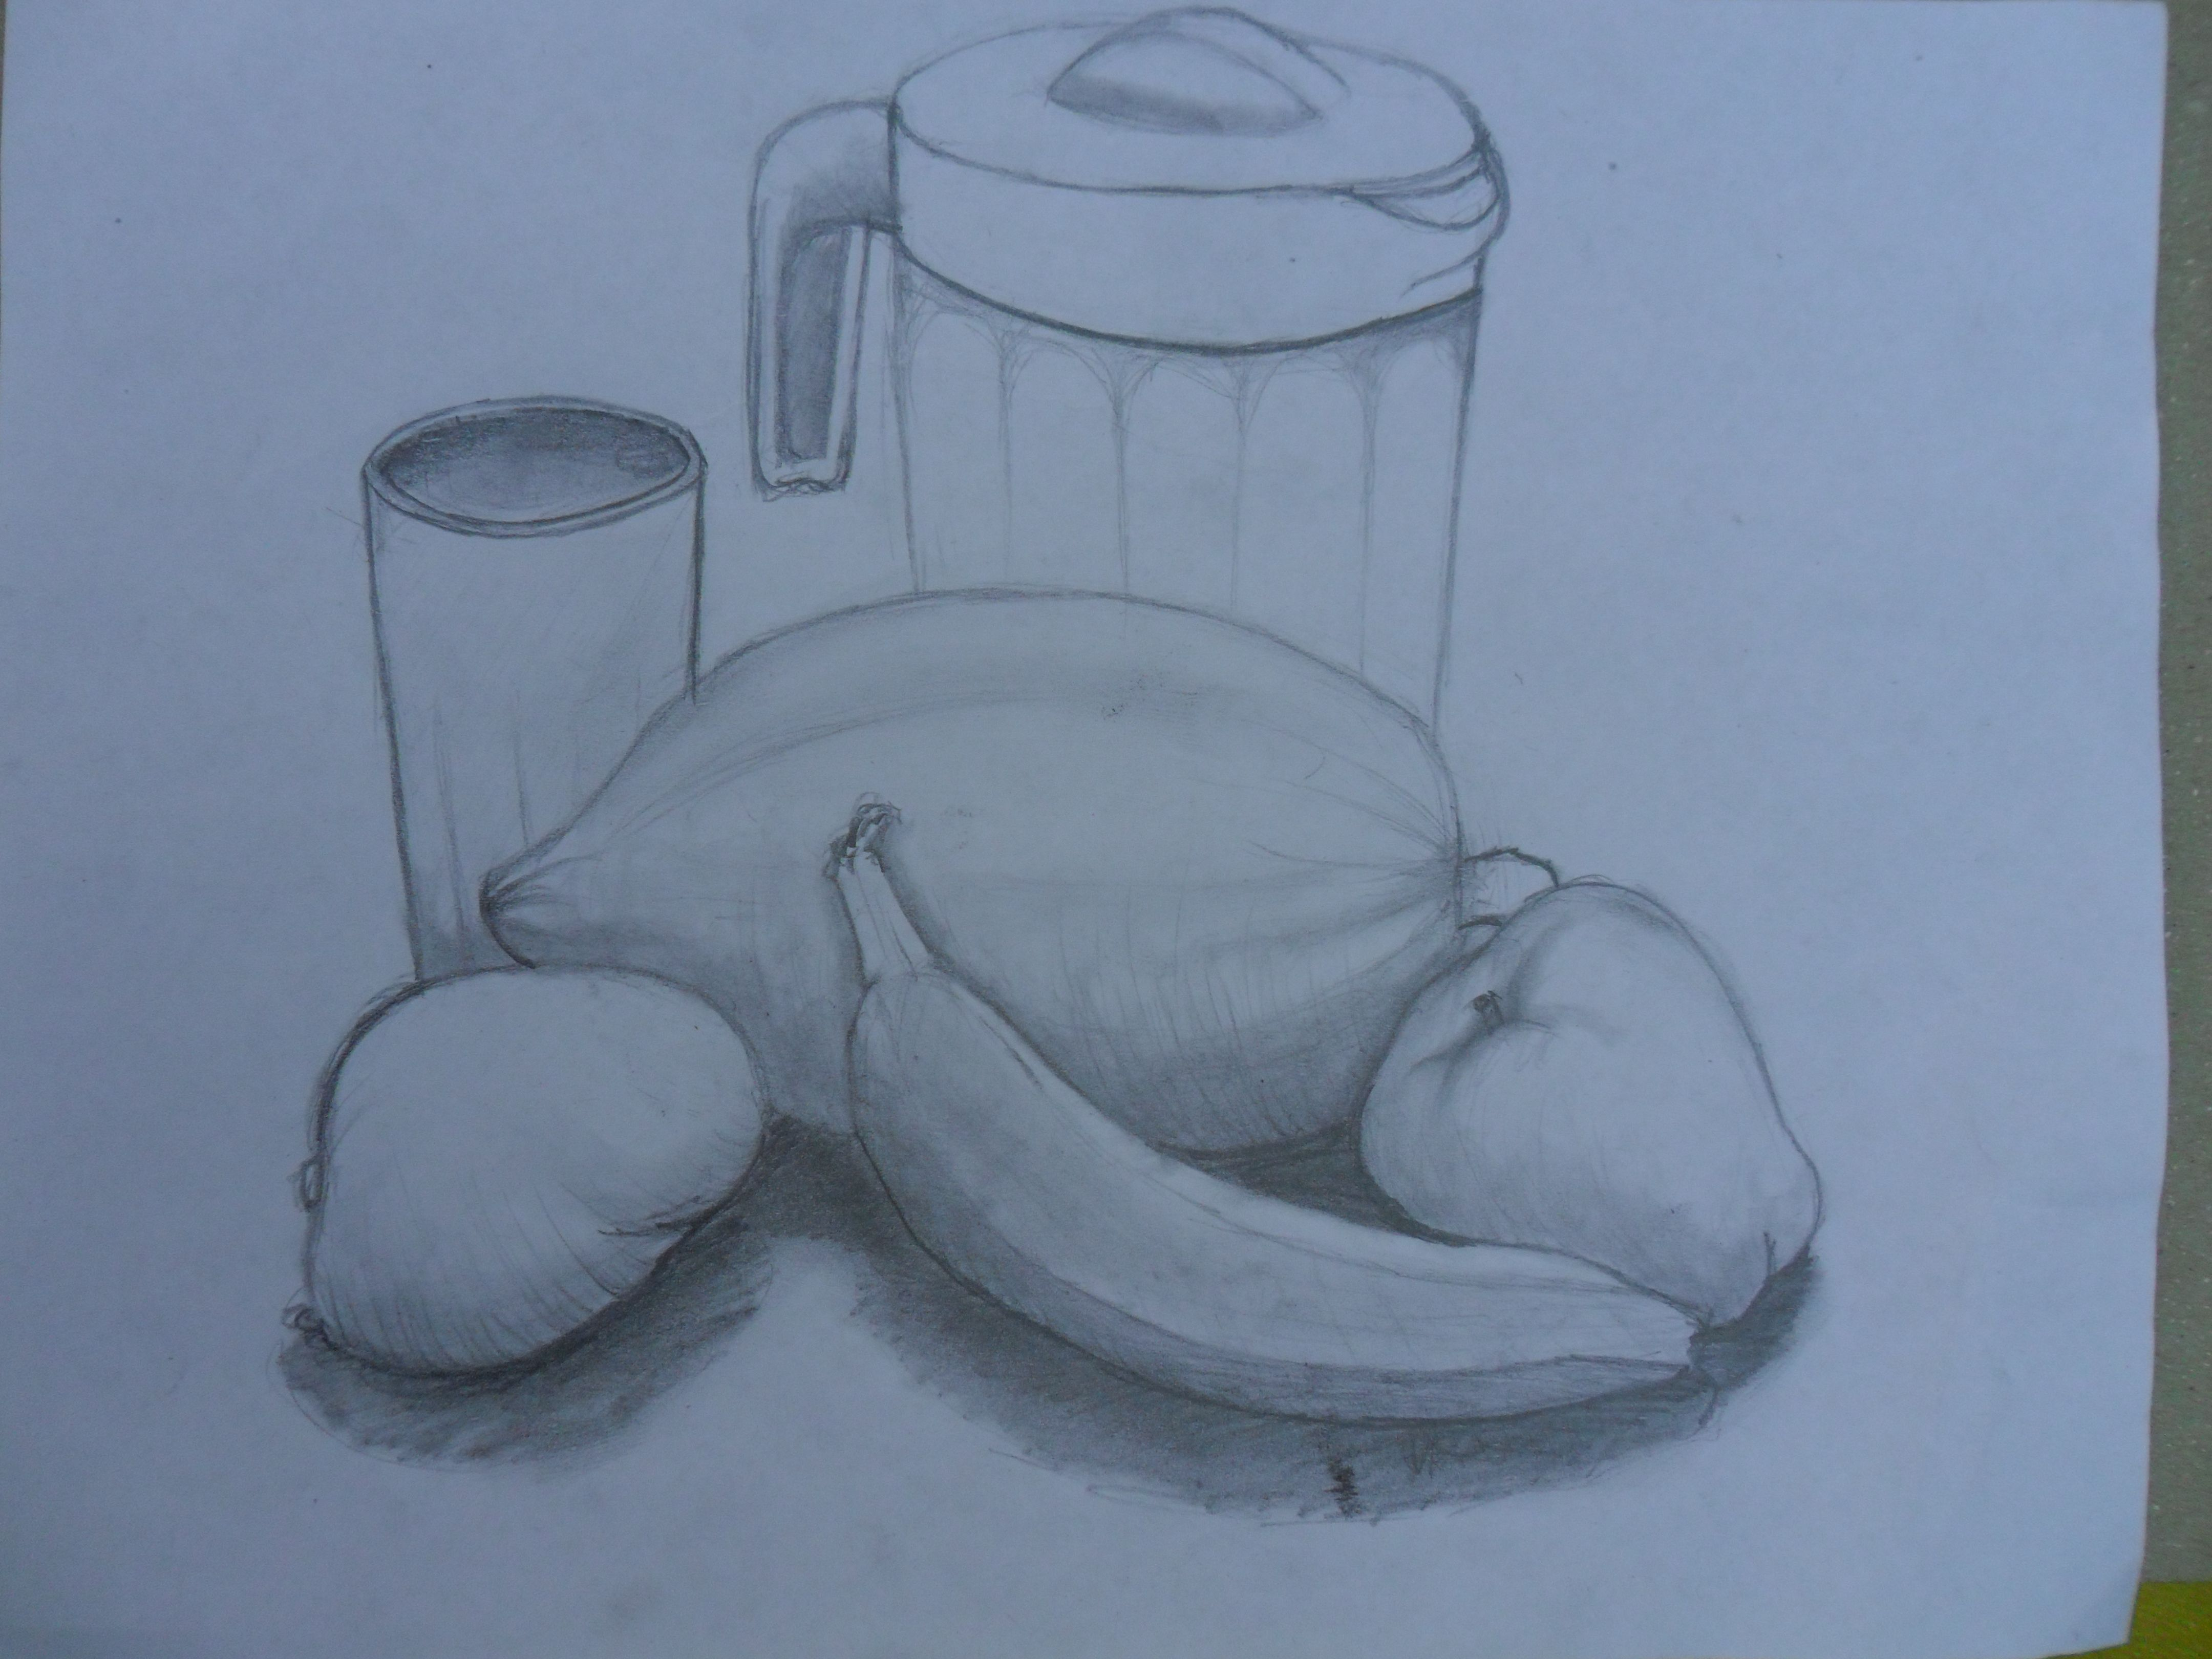 el ultimo de mis dibujos es un sencillo bodegn o naturaleza